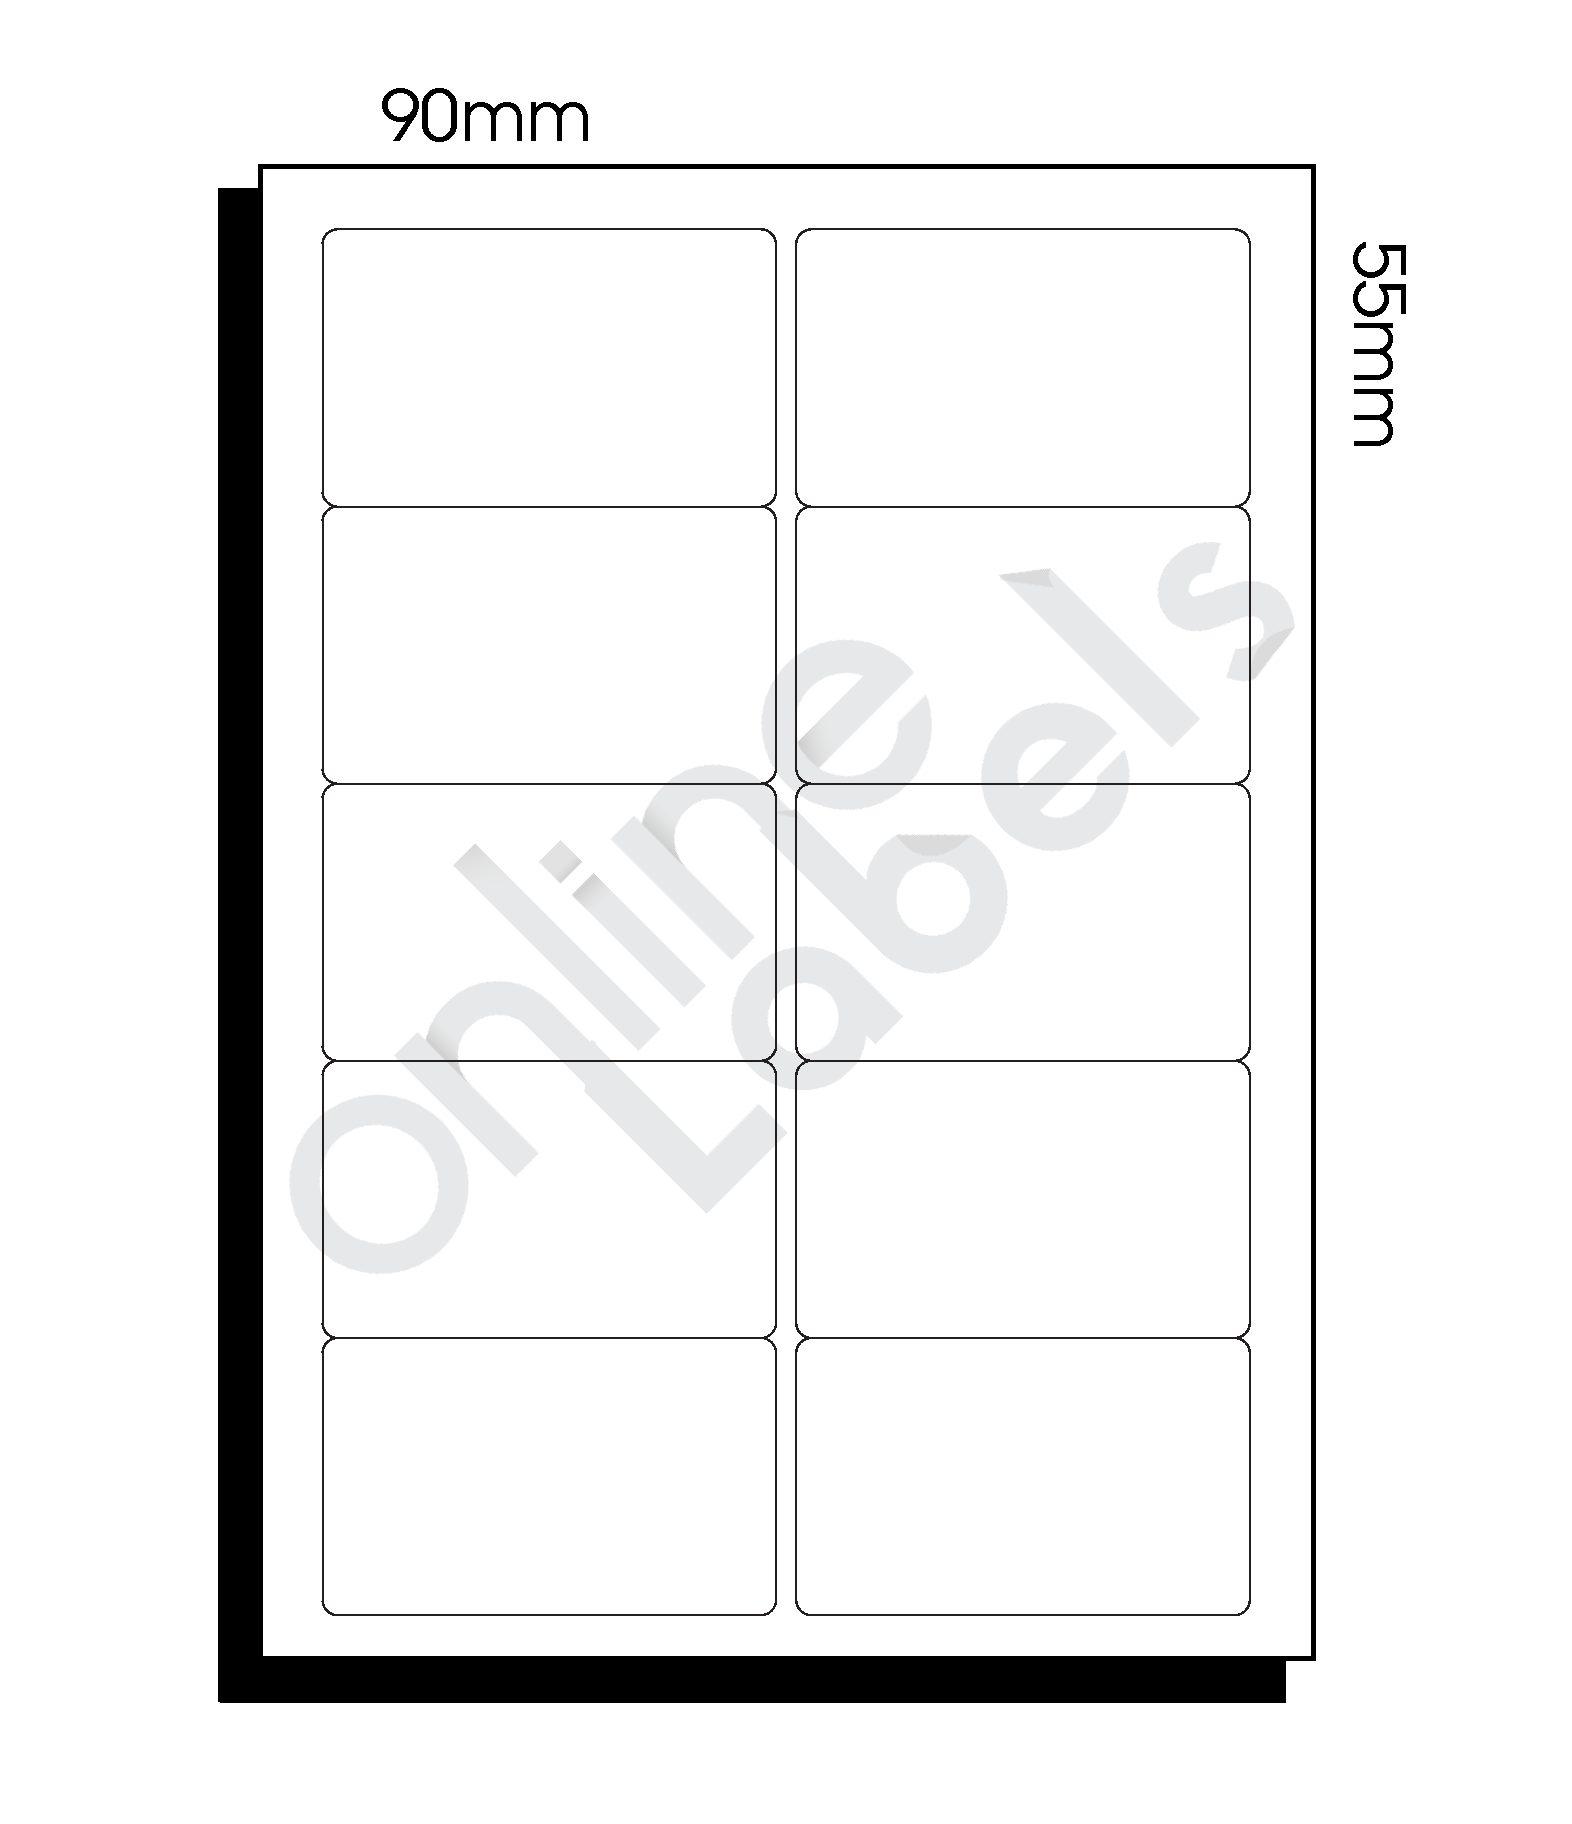 90mm x 55mm 10 labels per sheet online labels